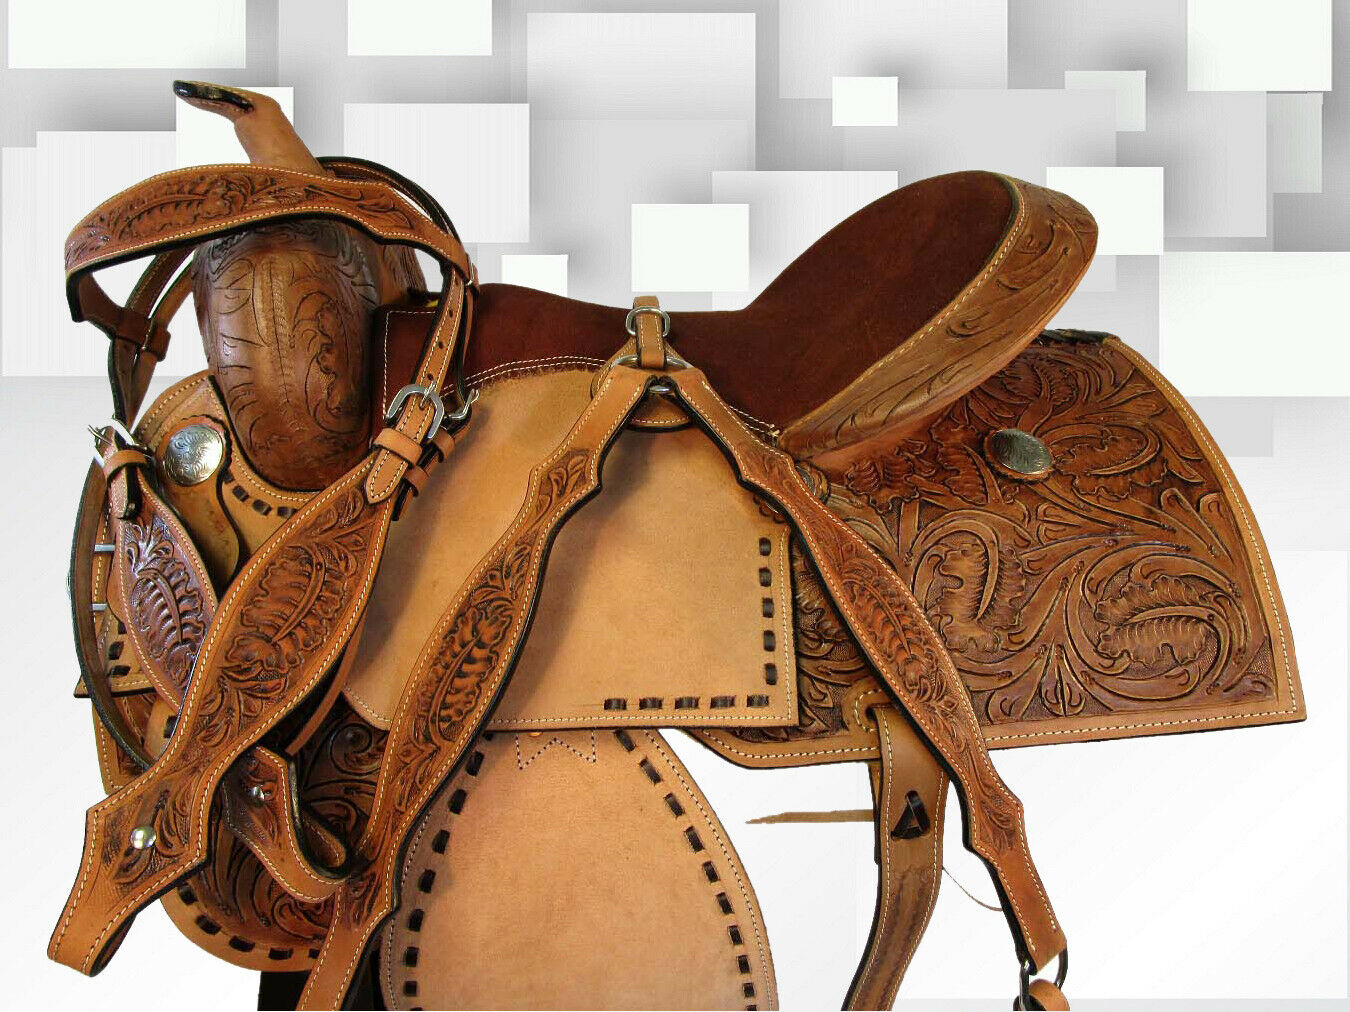 15 16 caballo occidental Gaited Trail placer barril Racing de cuero silla Tachuela Set